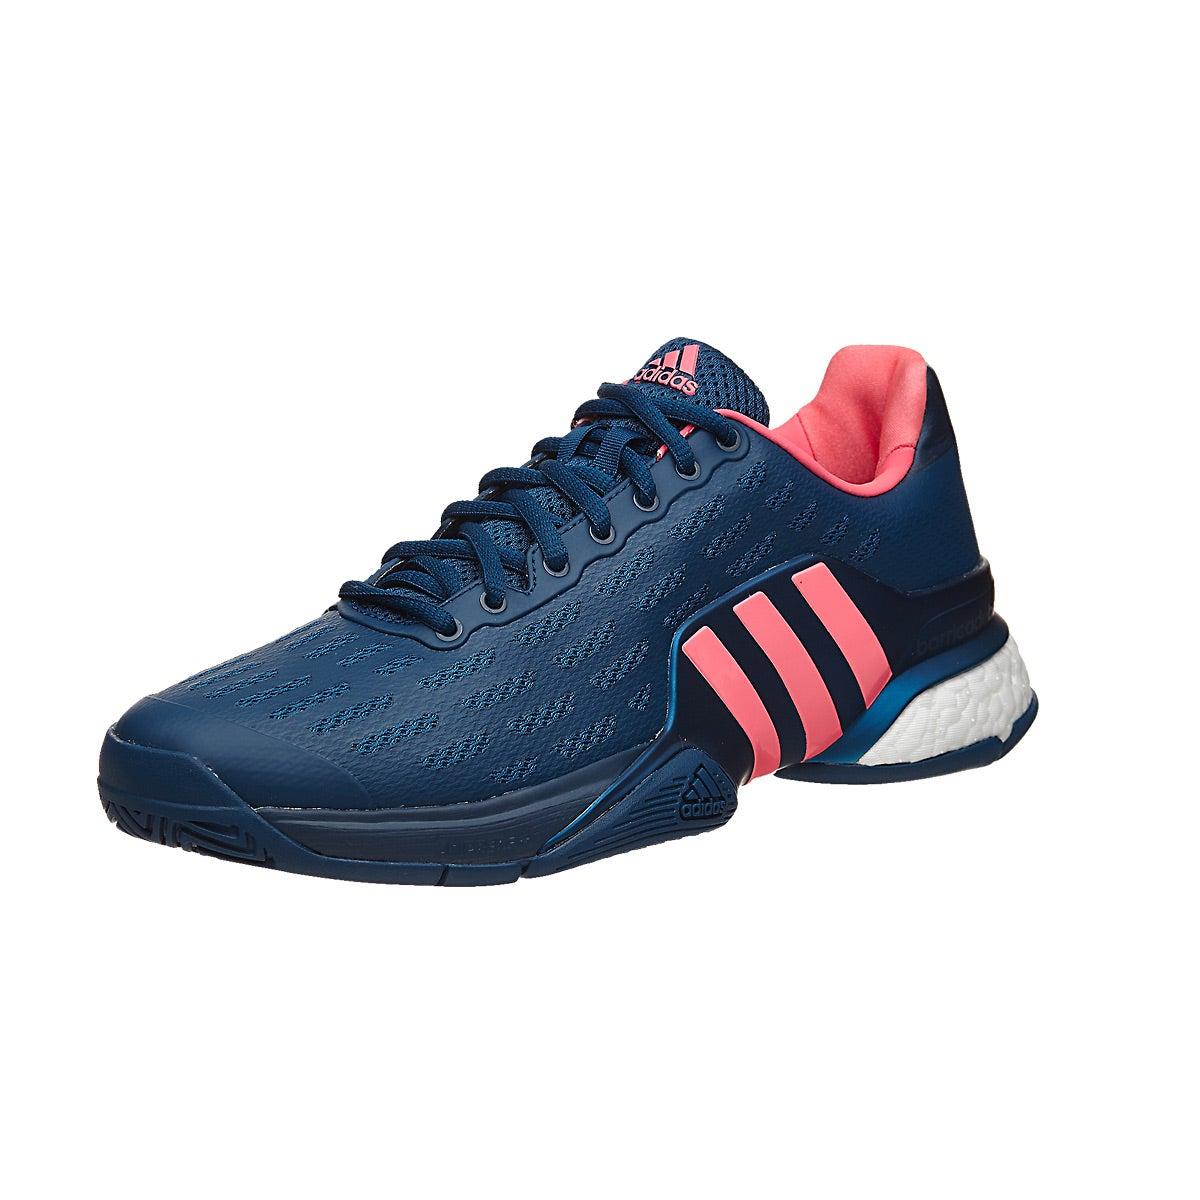 adidas barricade 2016 boost navy pink mens shoe